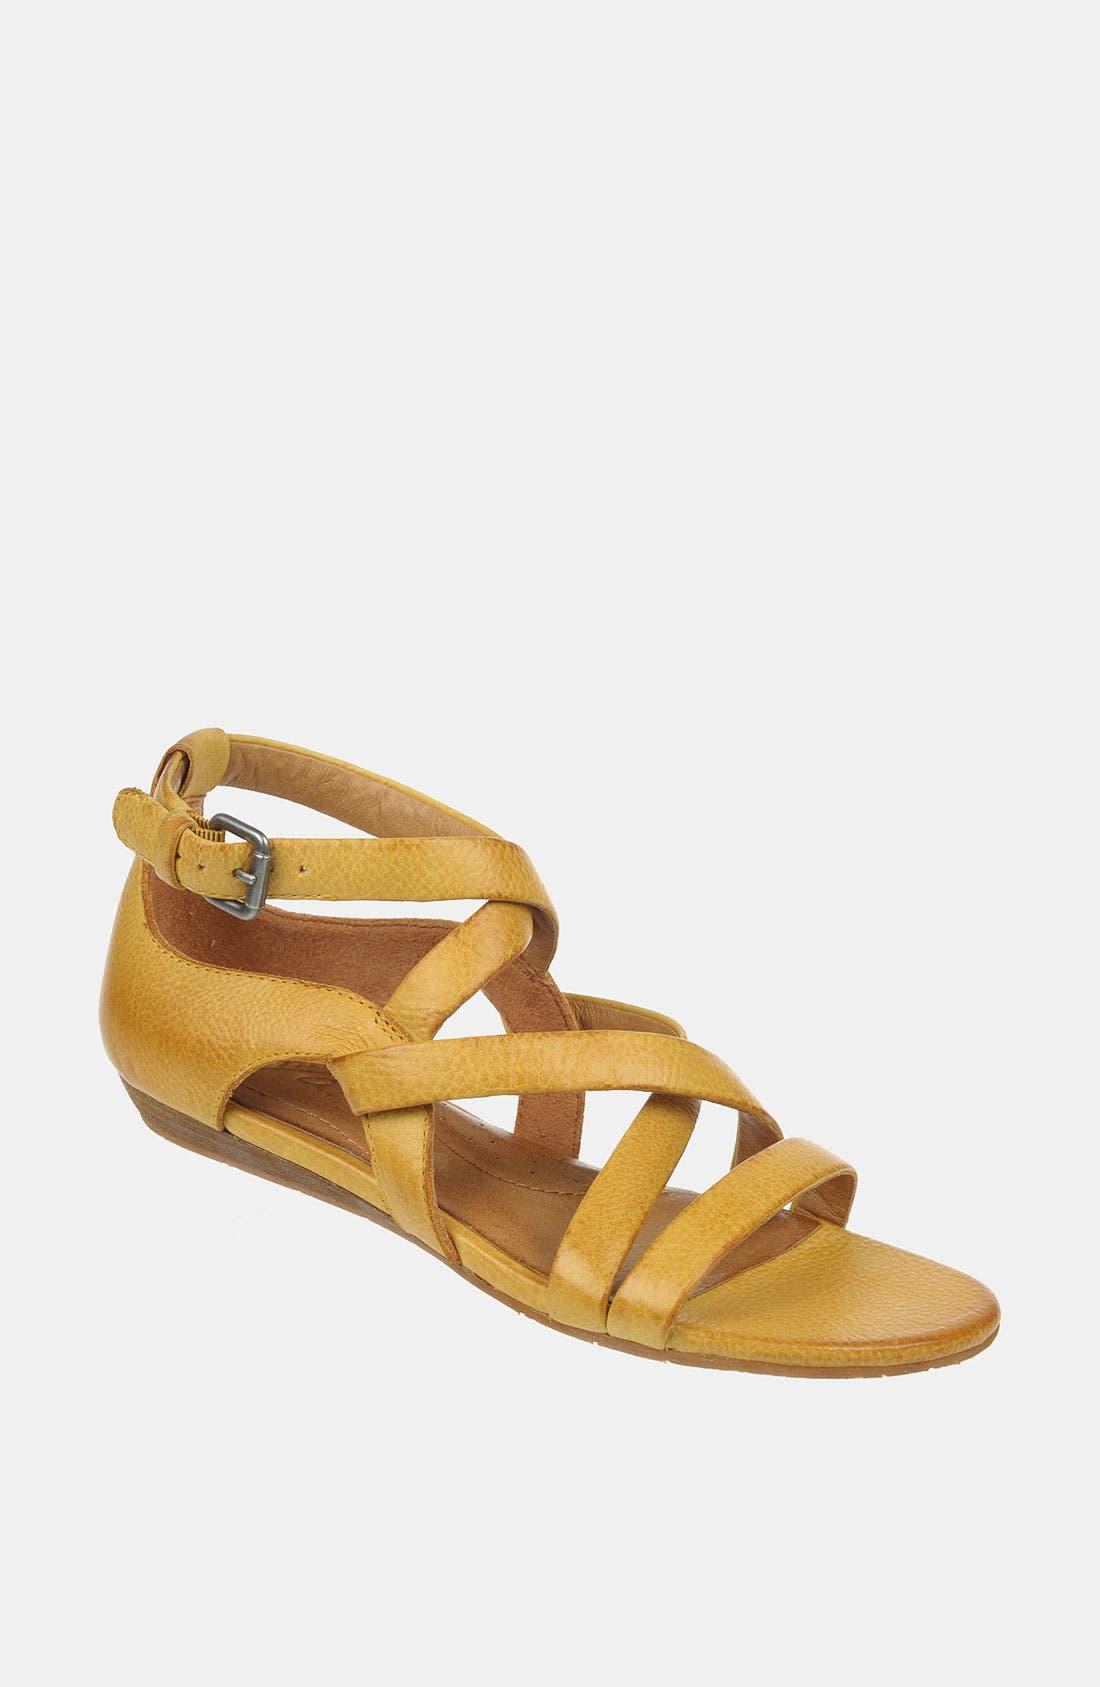 Alternate Image 1 Selected - Naya 'Hillary' Sandal